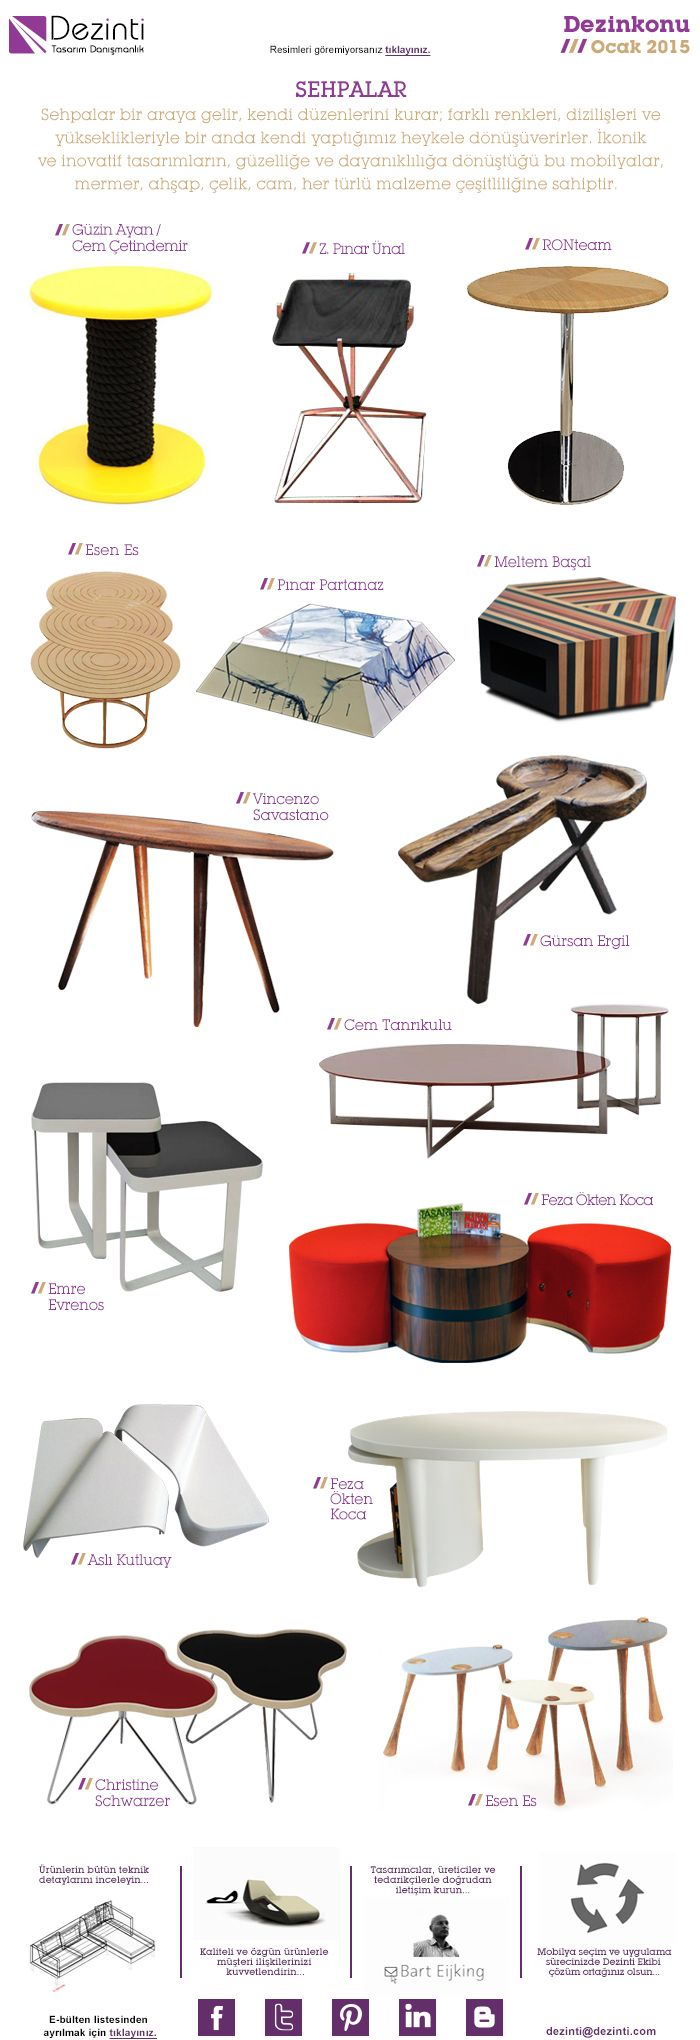 Side Tables http://www.dezinti.com/kategori/masalar/sehpa